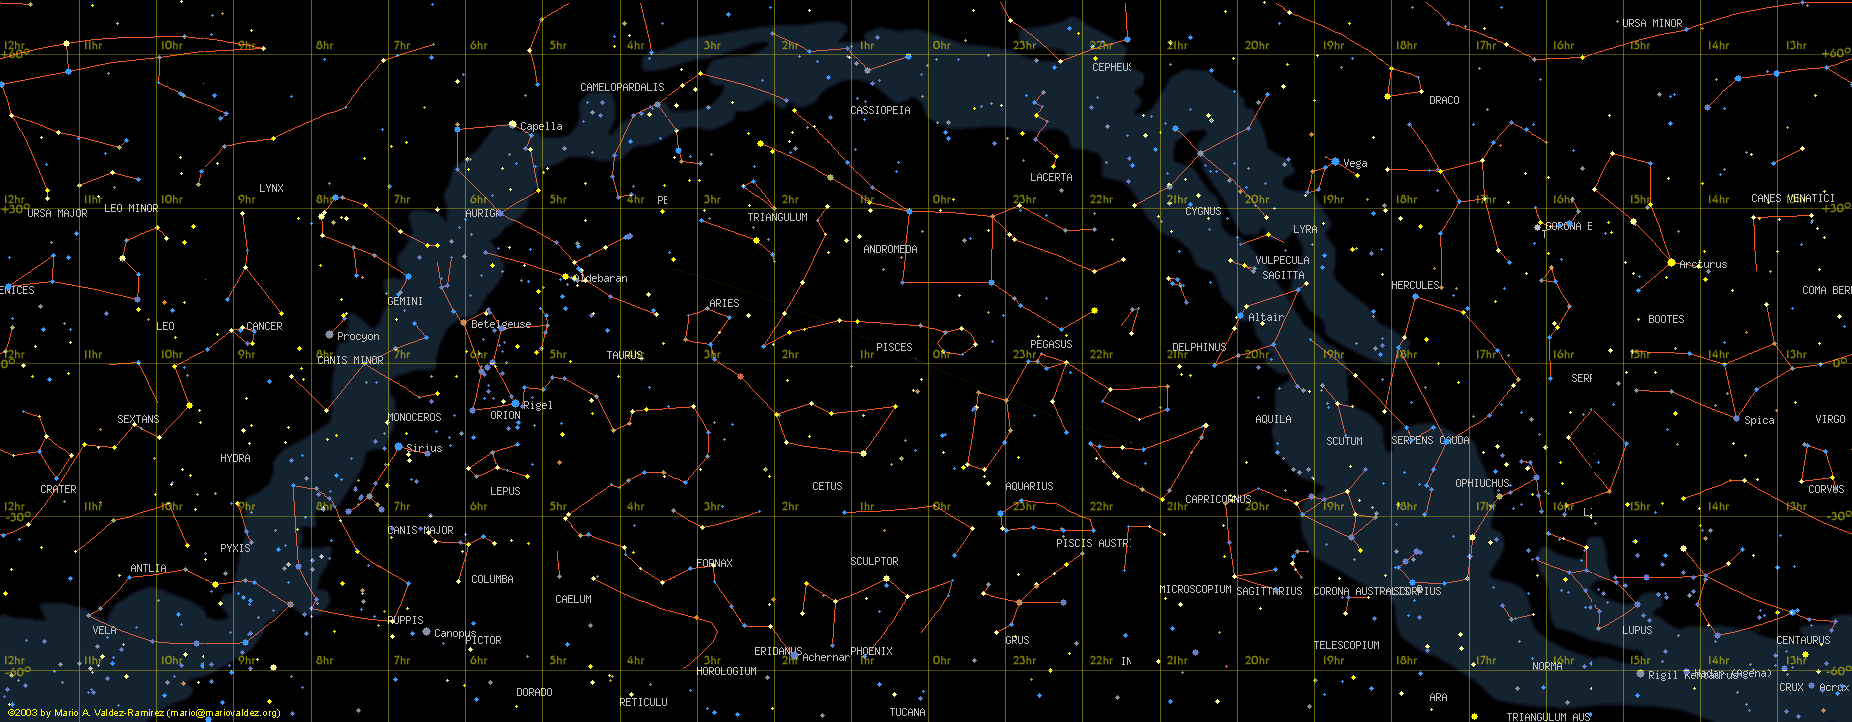 interactive astronomy map - photo #13